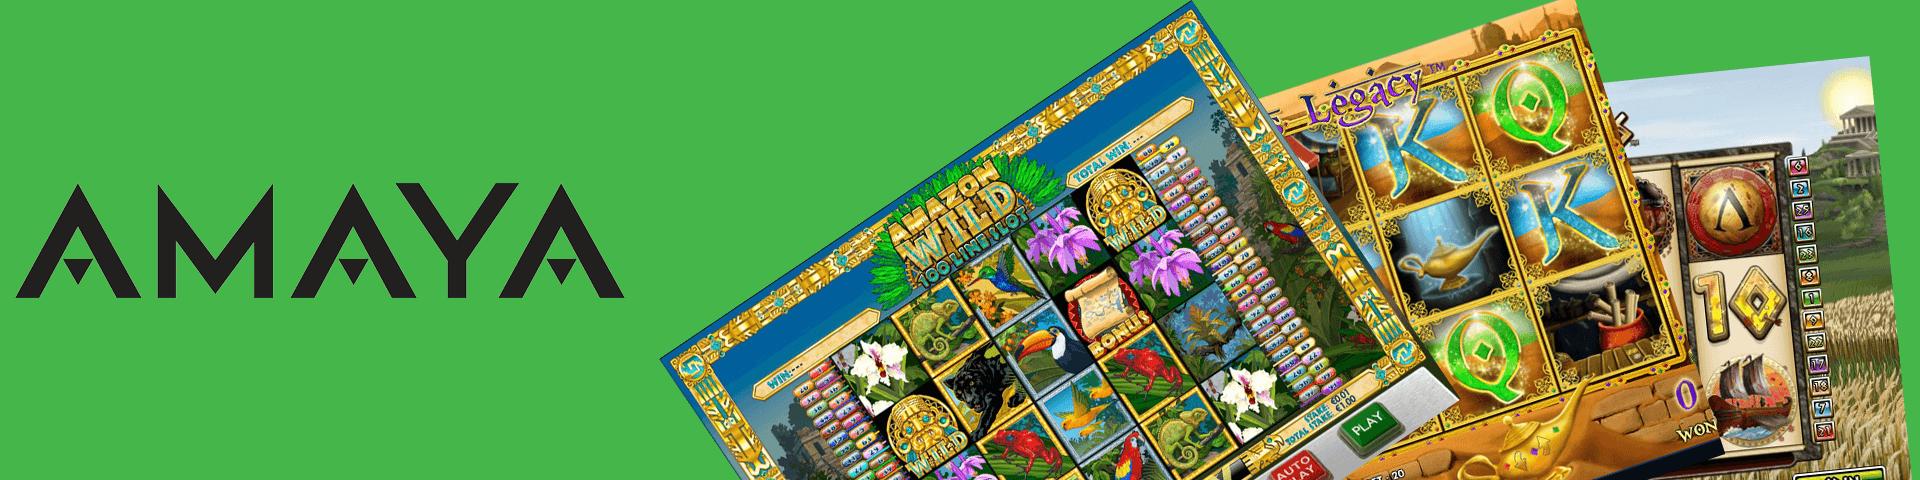 jocuri-casino-Amaya Gaming Group-multabafta-slider